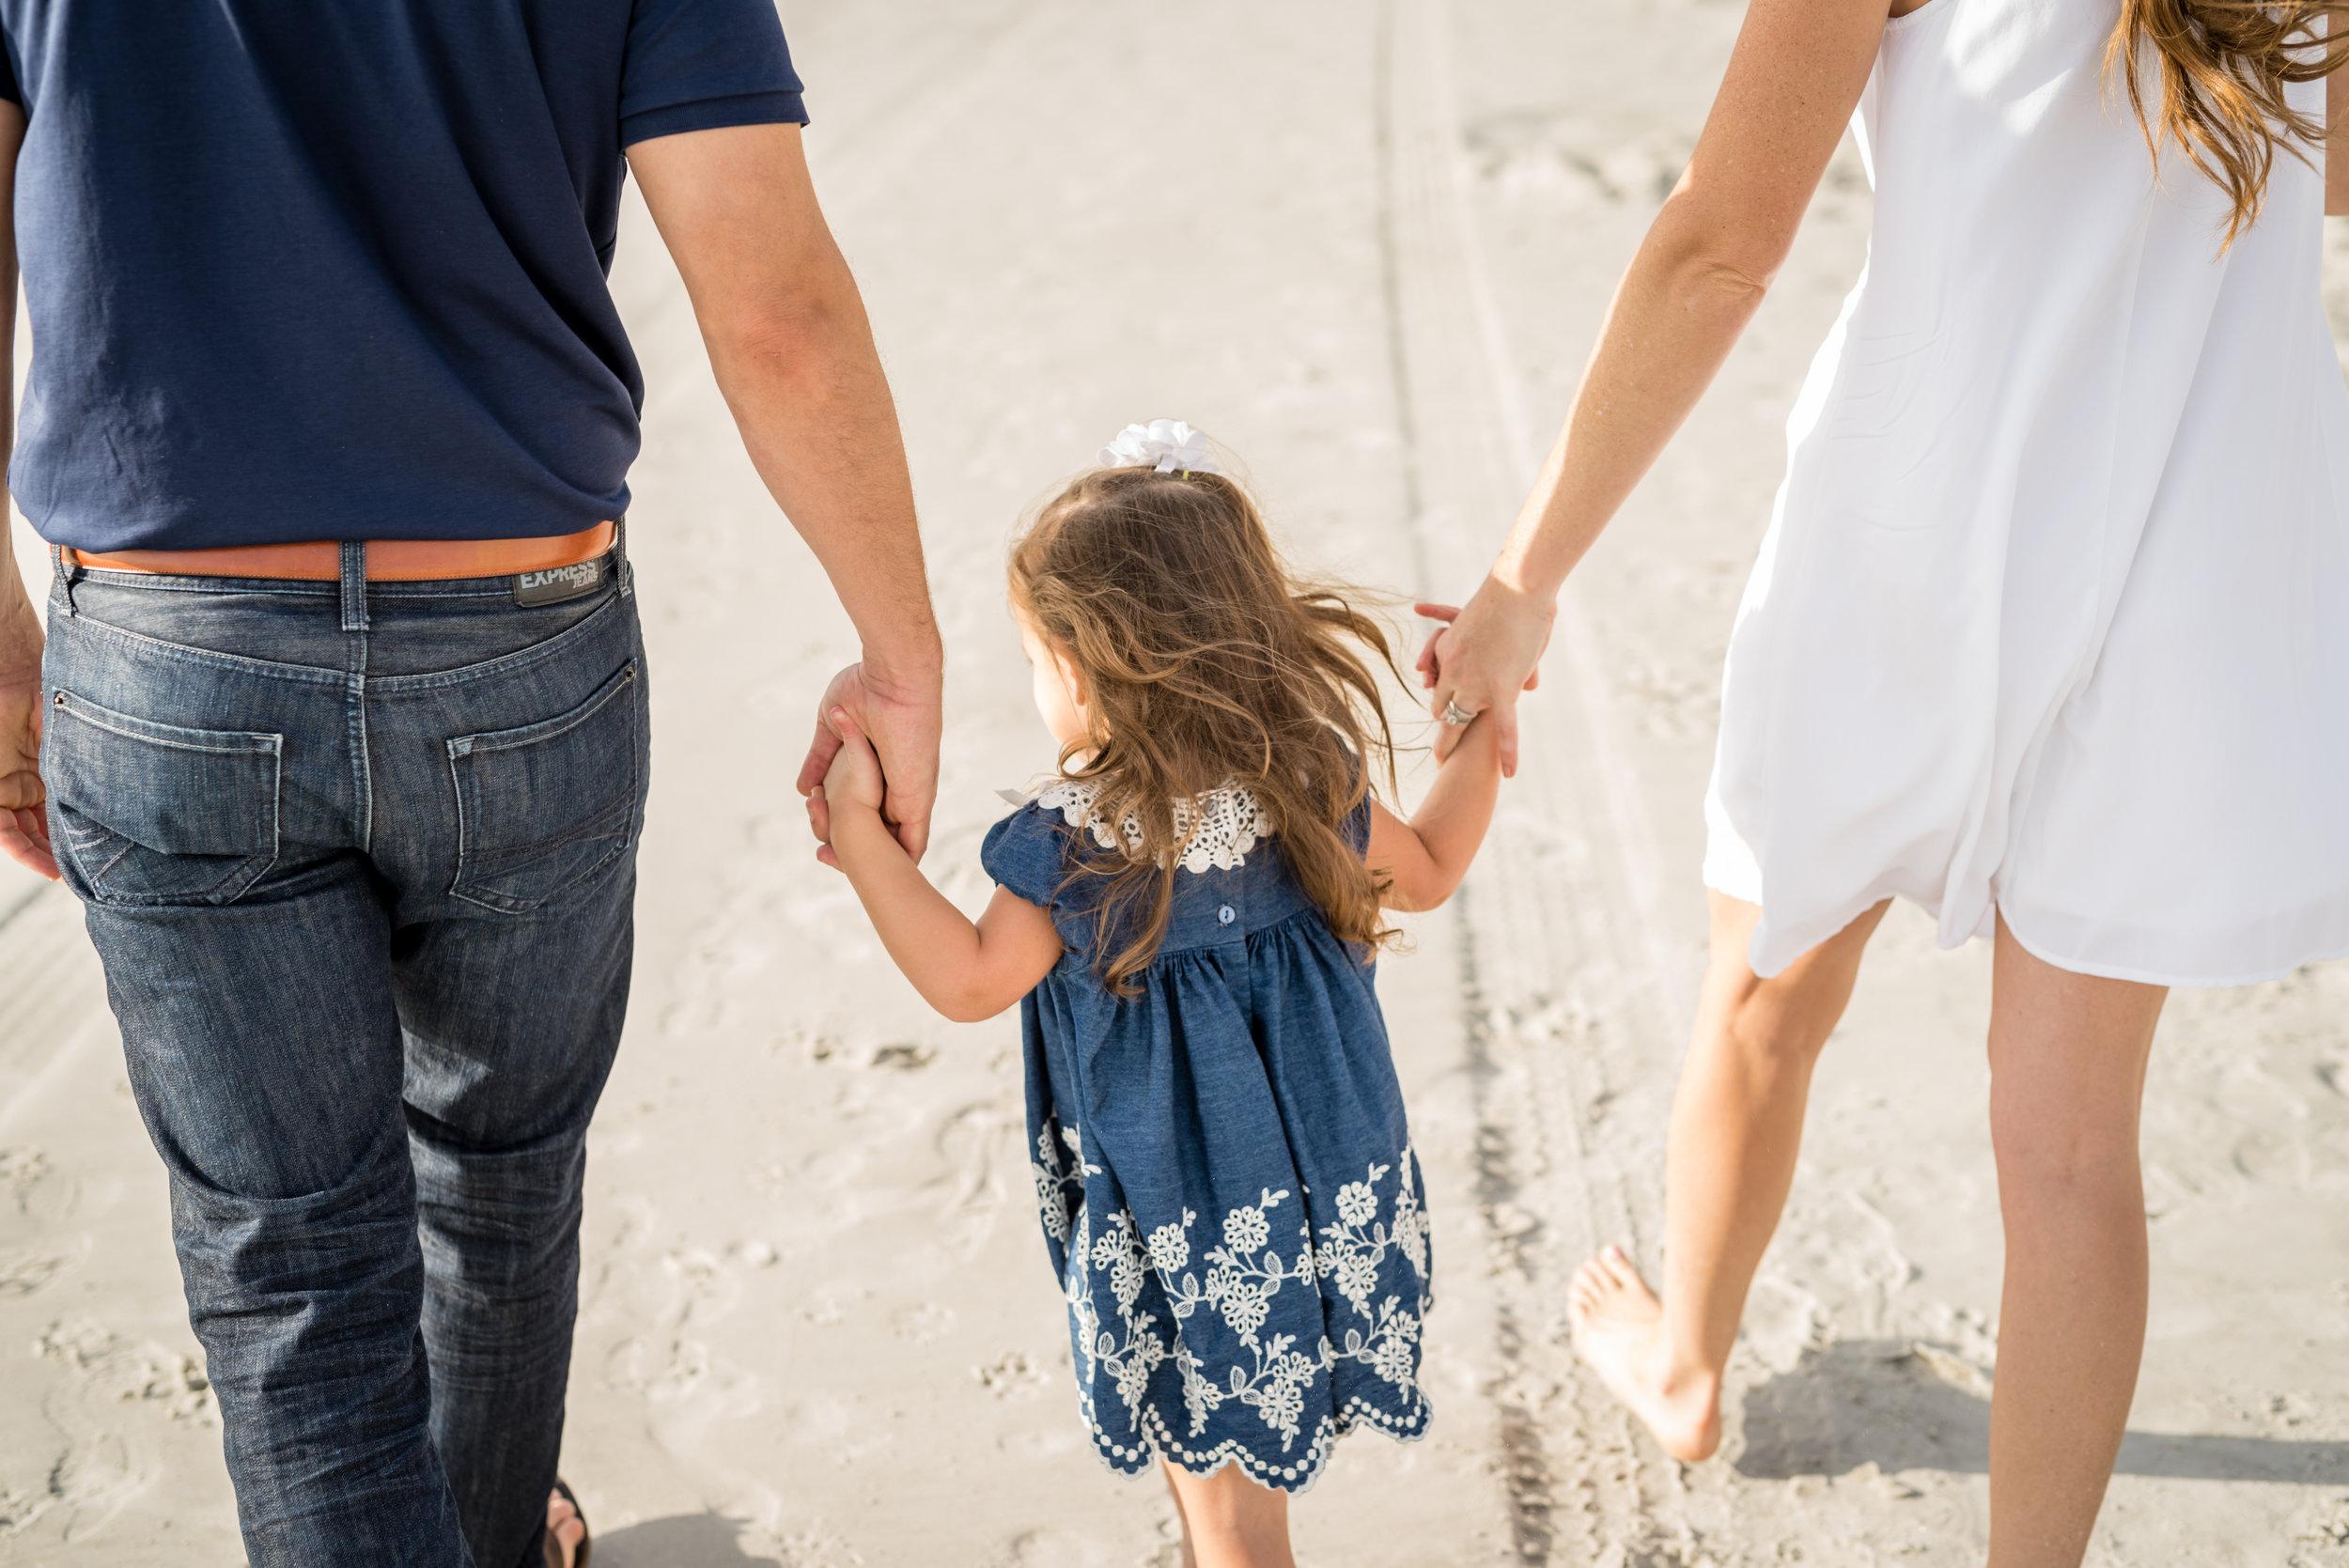 beachfamilyphotos-kristingroverimages.jpg